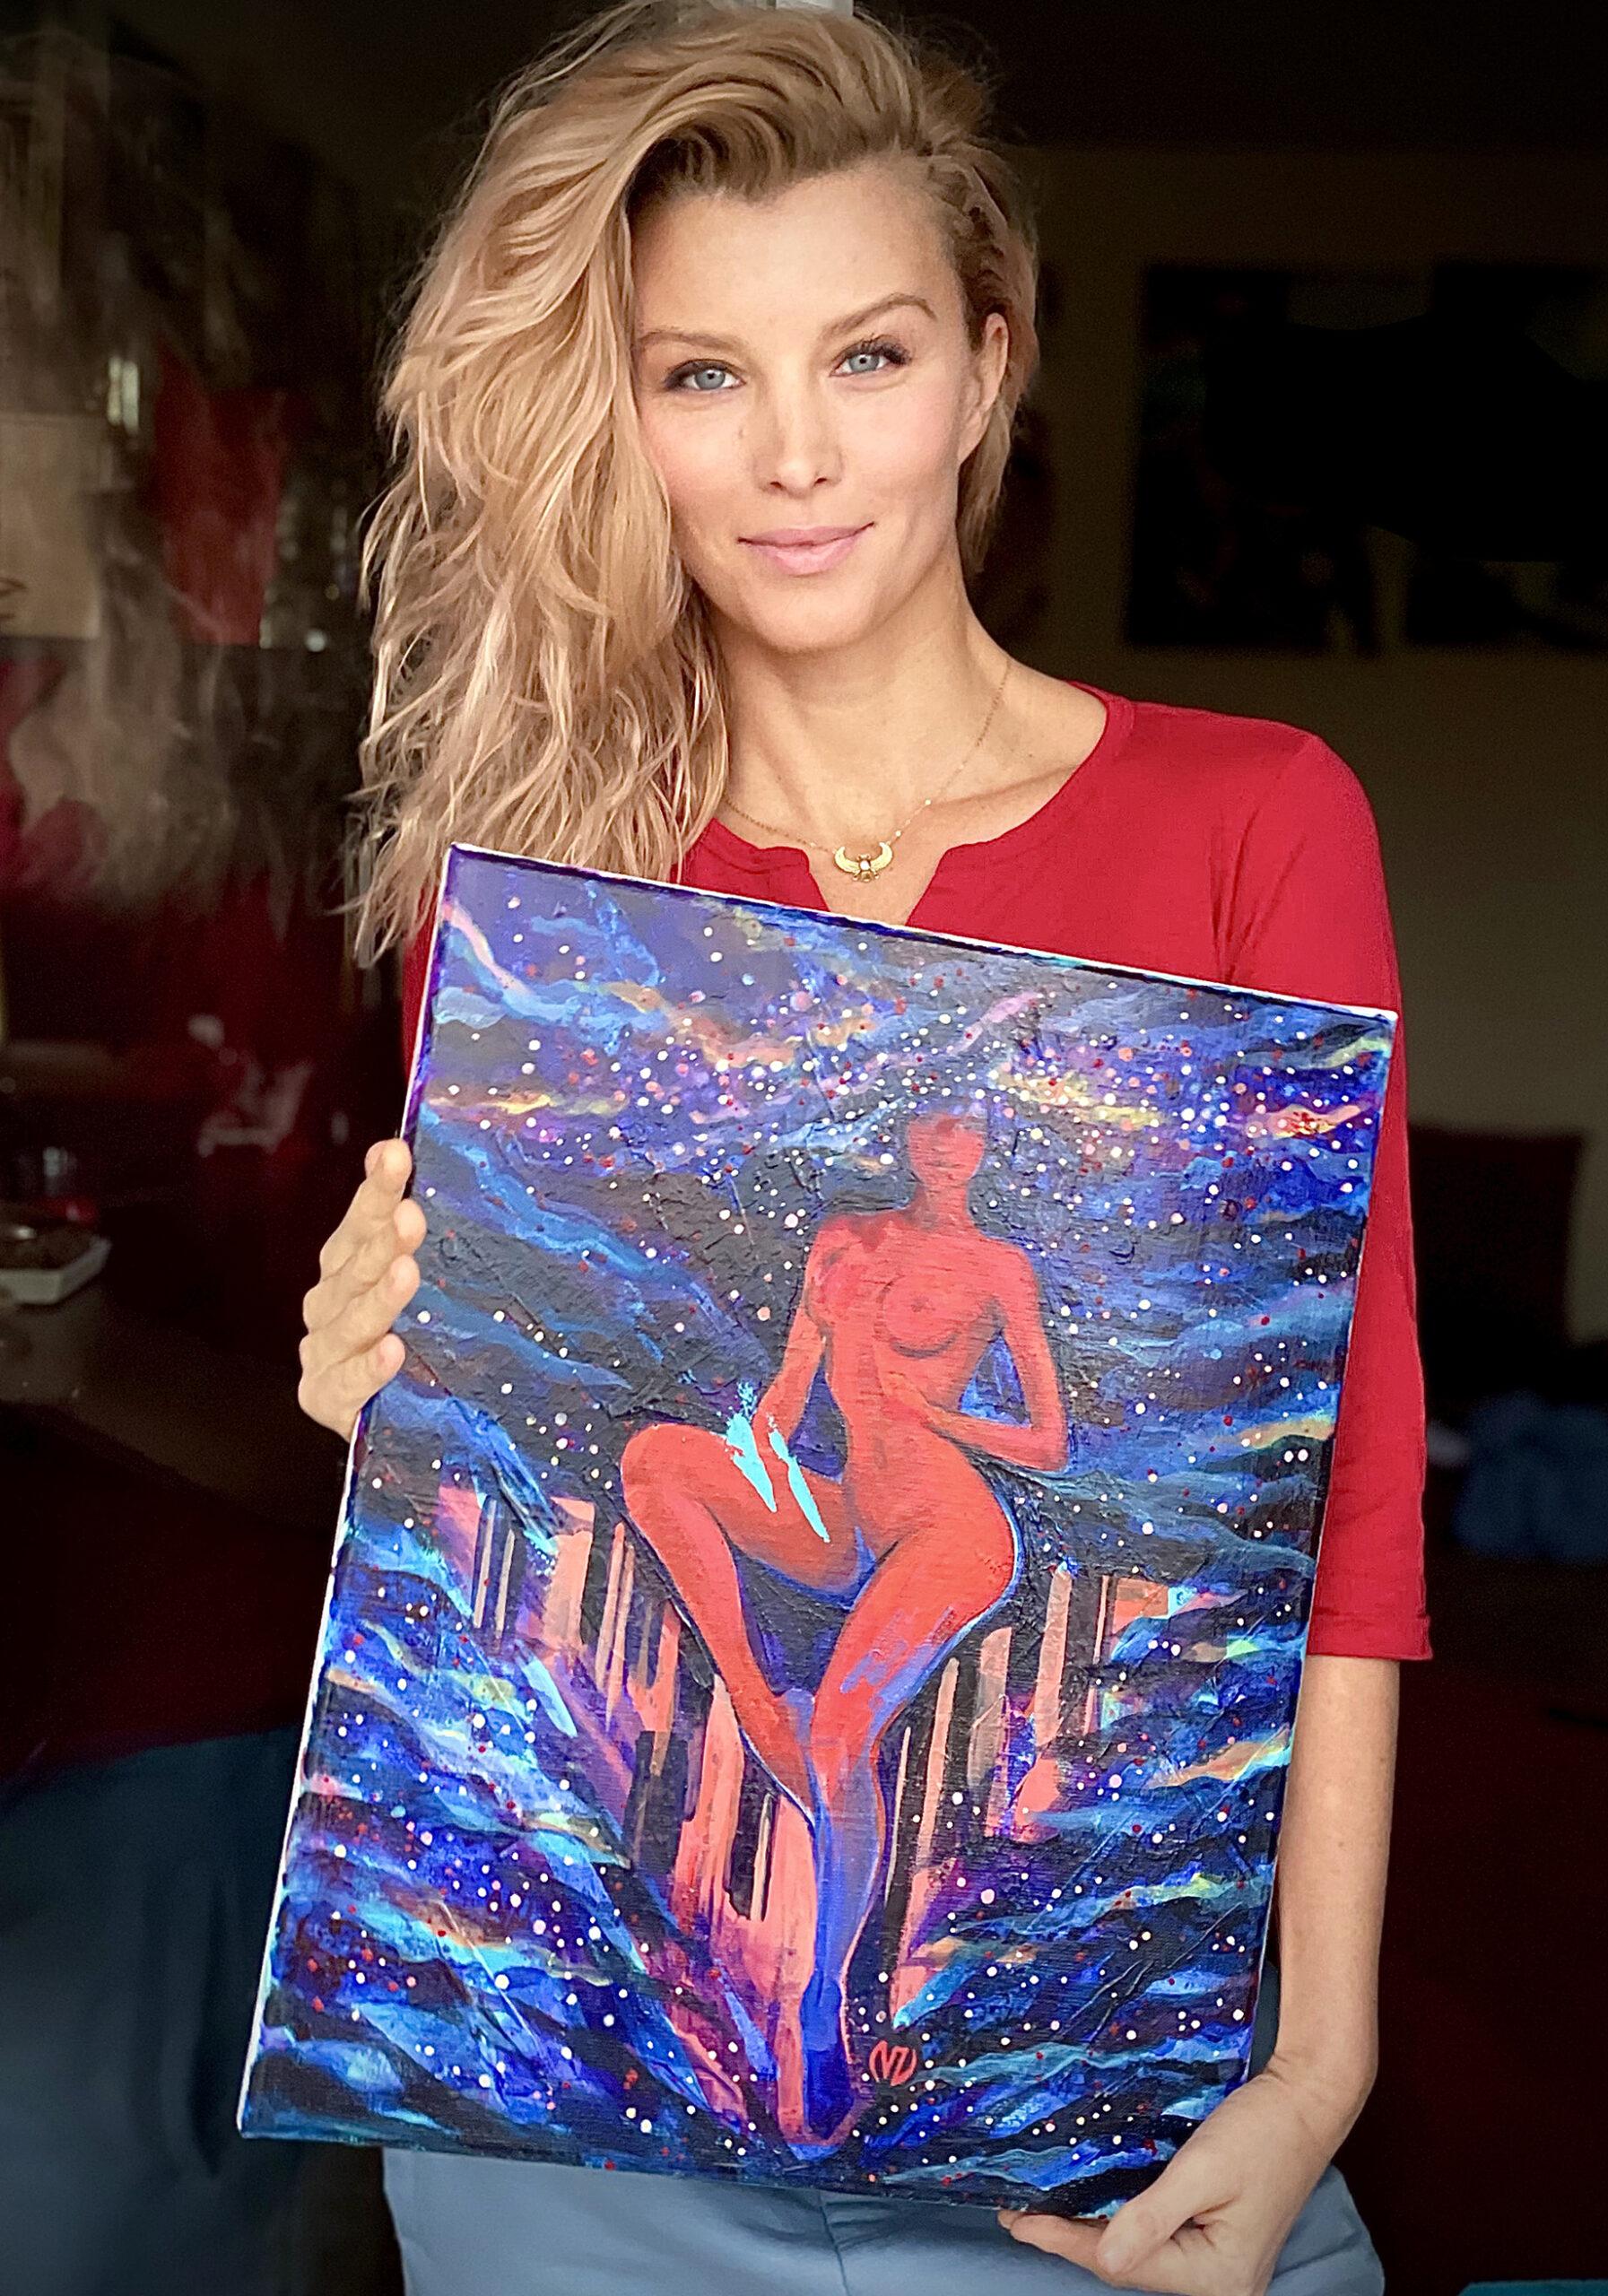 01.40x50-Cosmic-ViorikaZagorowska-ArtForSaleViorika